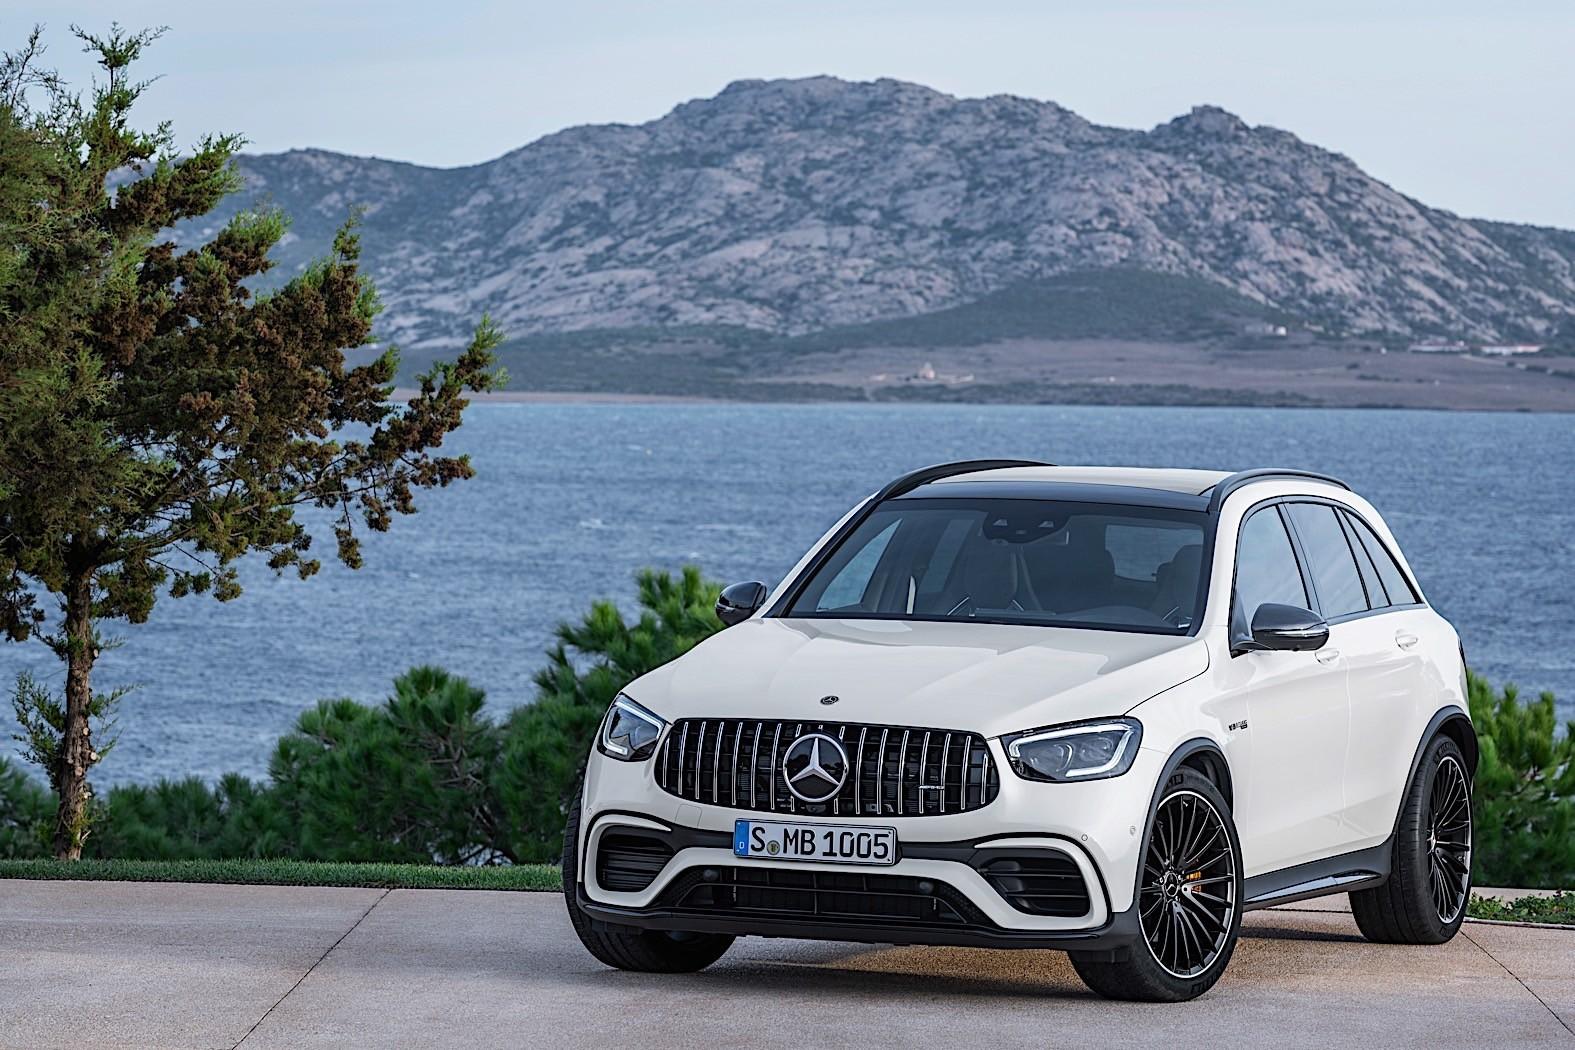 2020 Mercedes-AMG GLC 63 Review - autoevolution